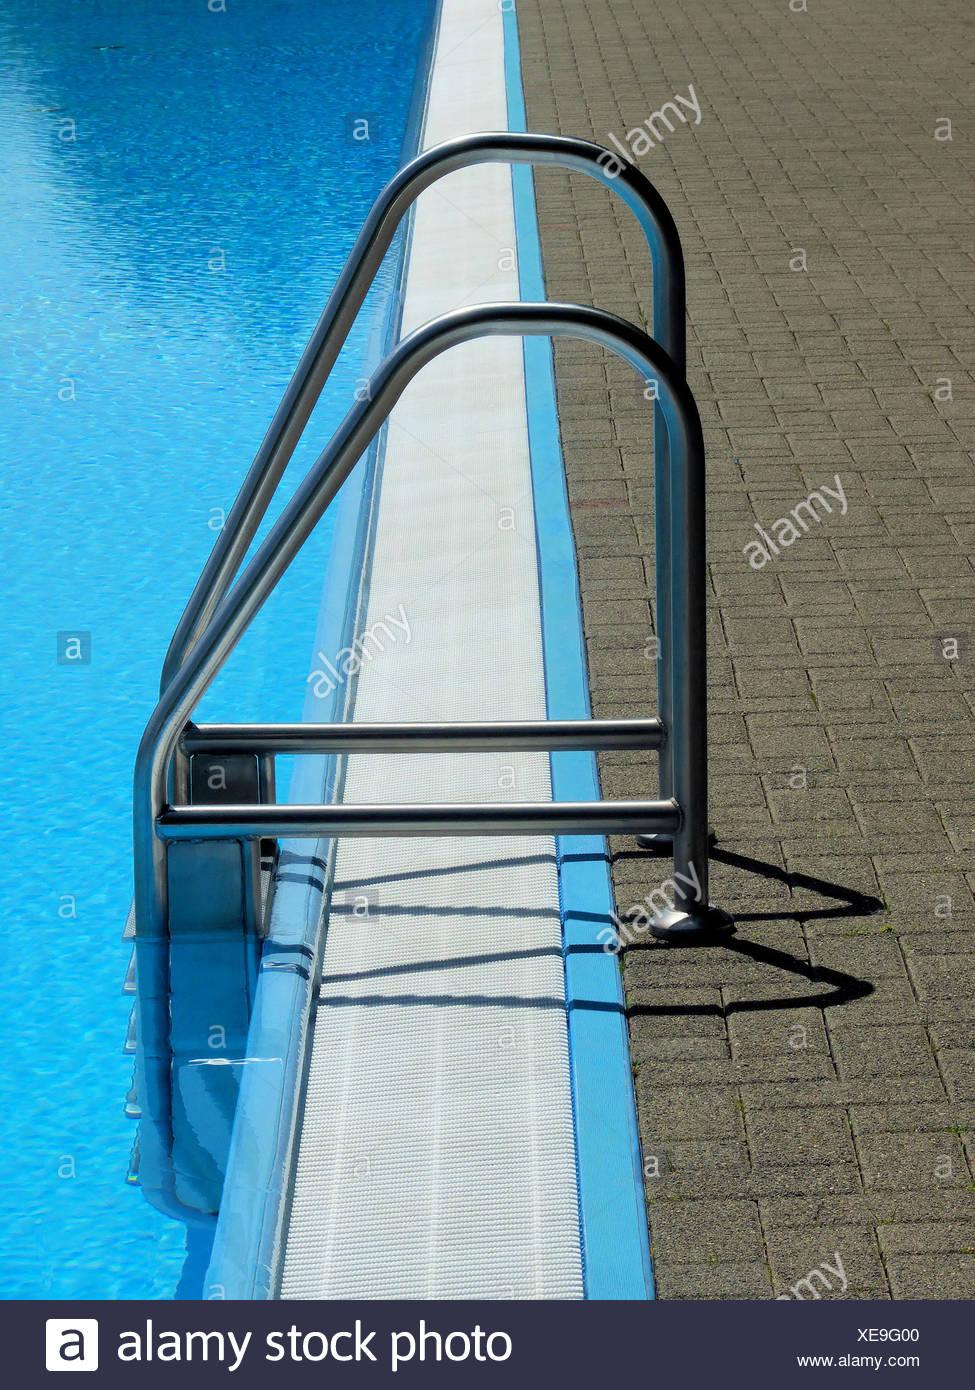 Einführung der Swimming pool Stockbild